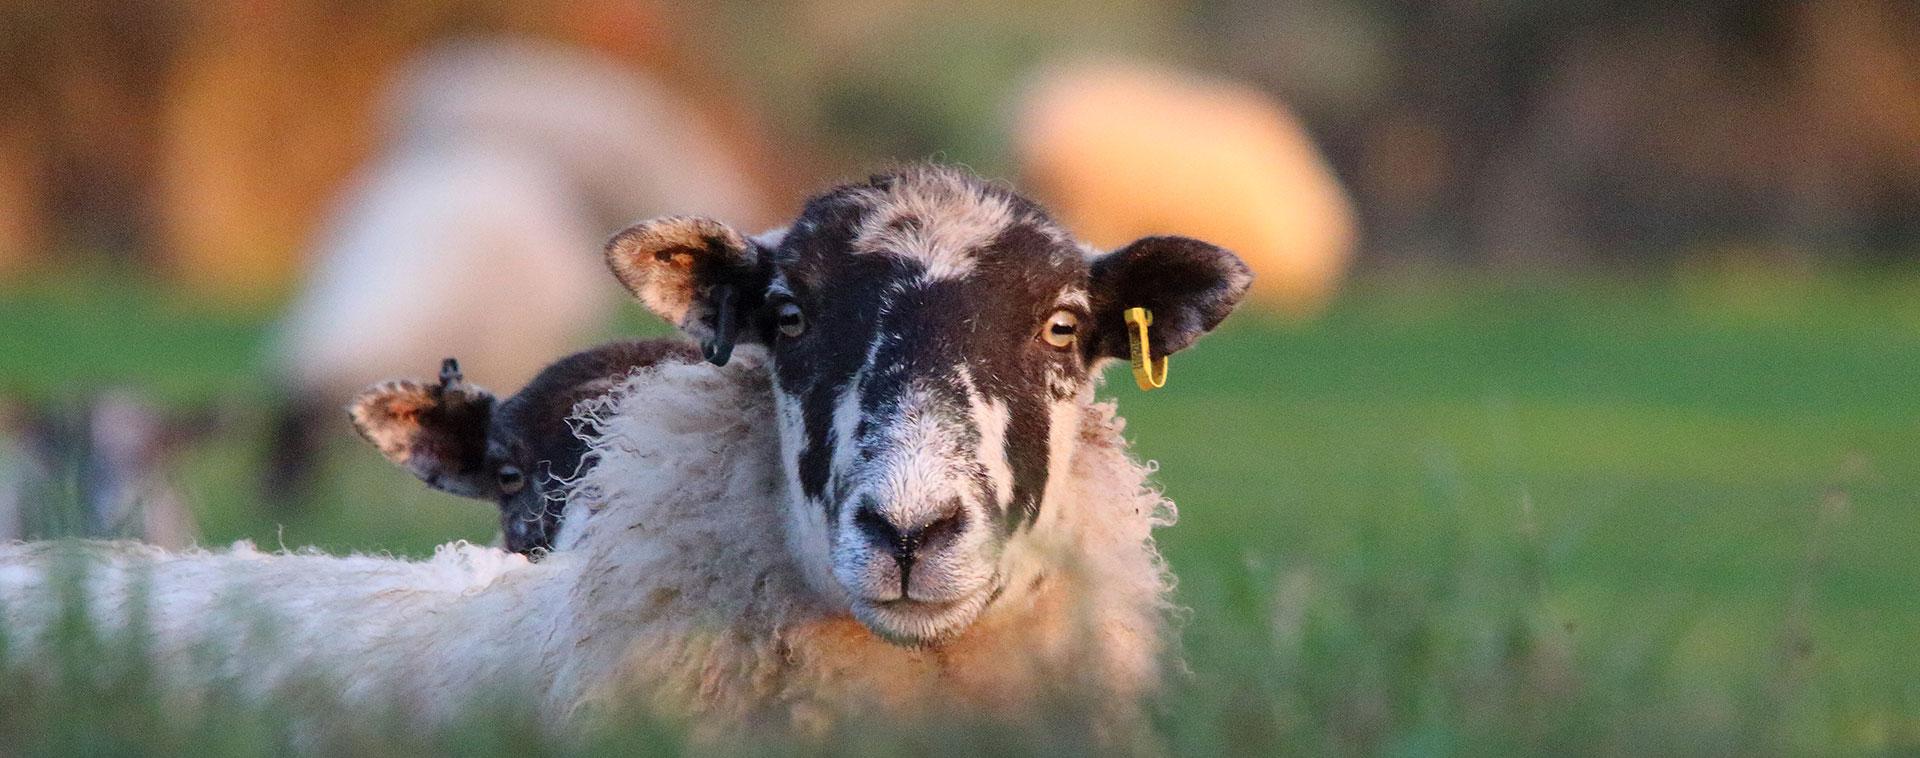 sheep 1920